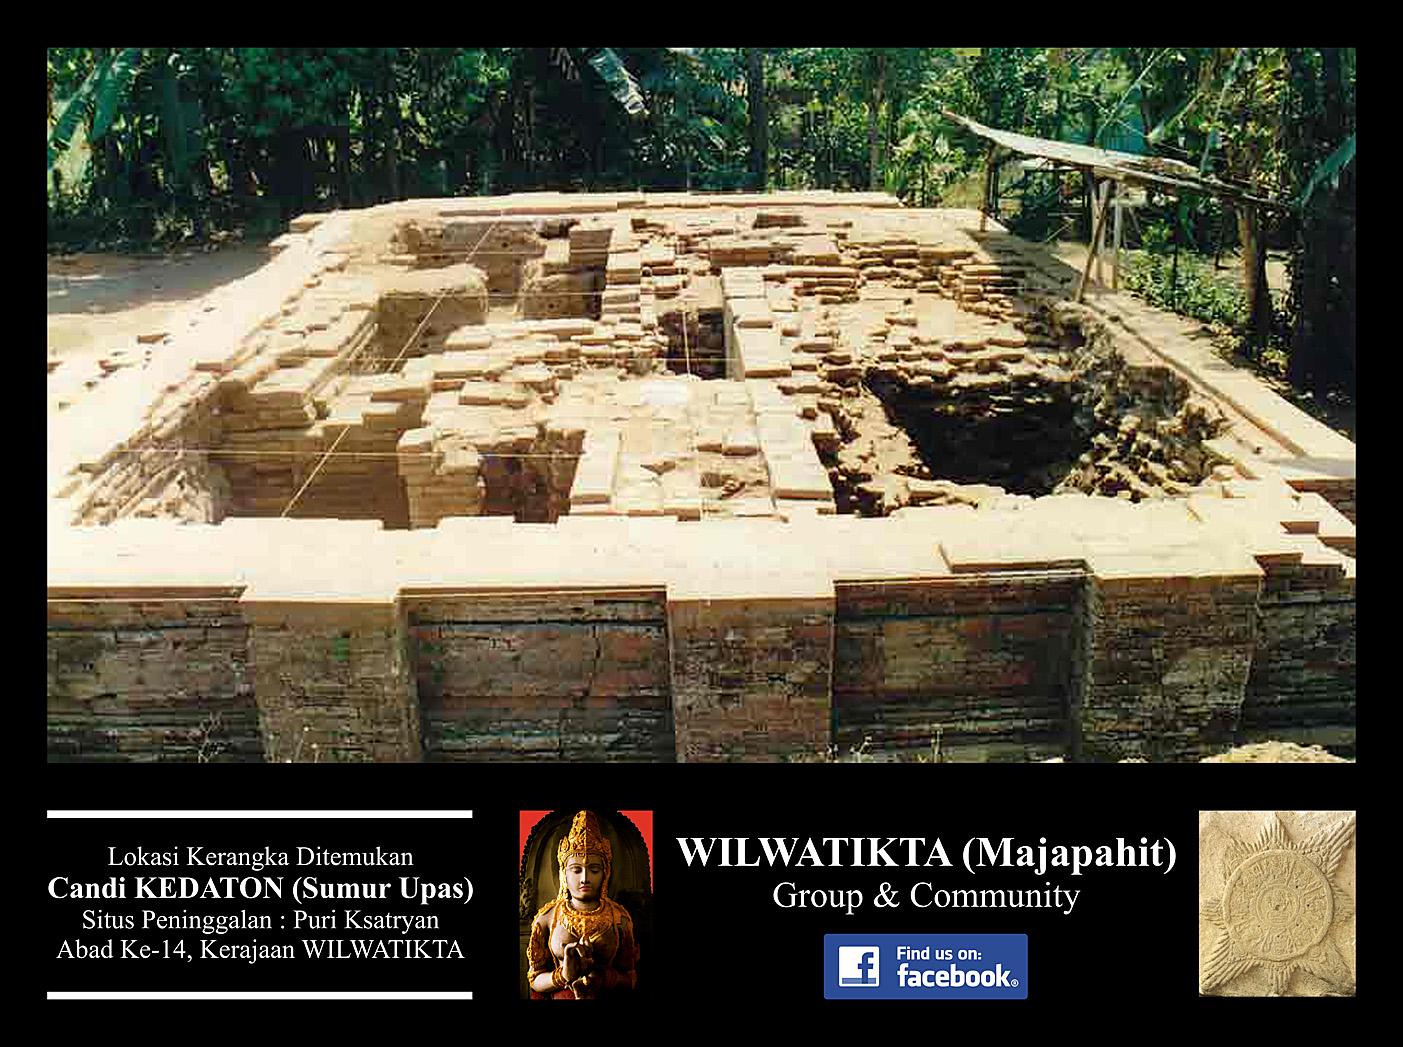 Candi Kedaton Sumur Upas Peninggalan Kerajaan Wilwatikta Perhatikan Bentuk Bangunan